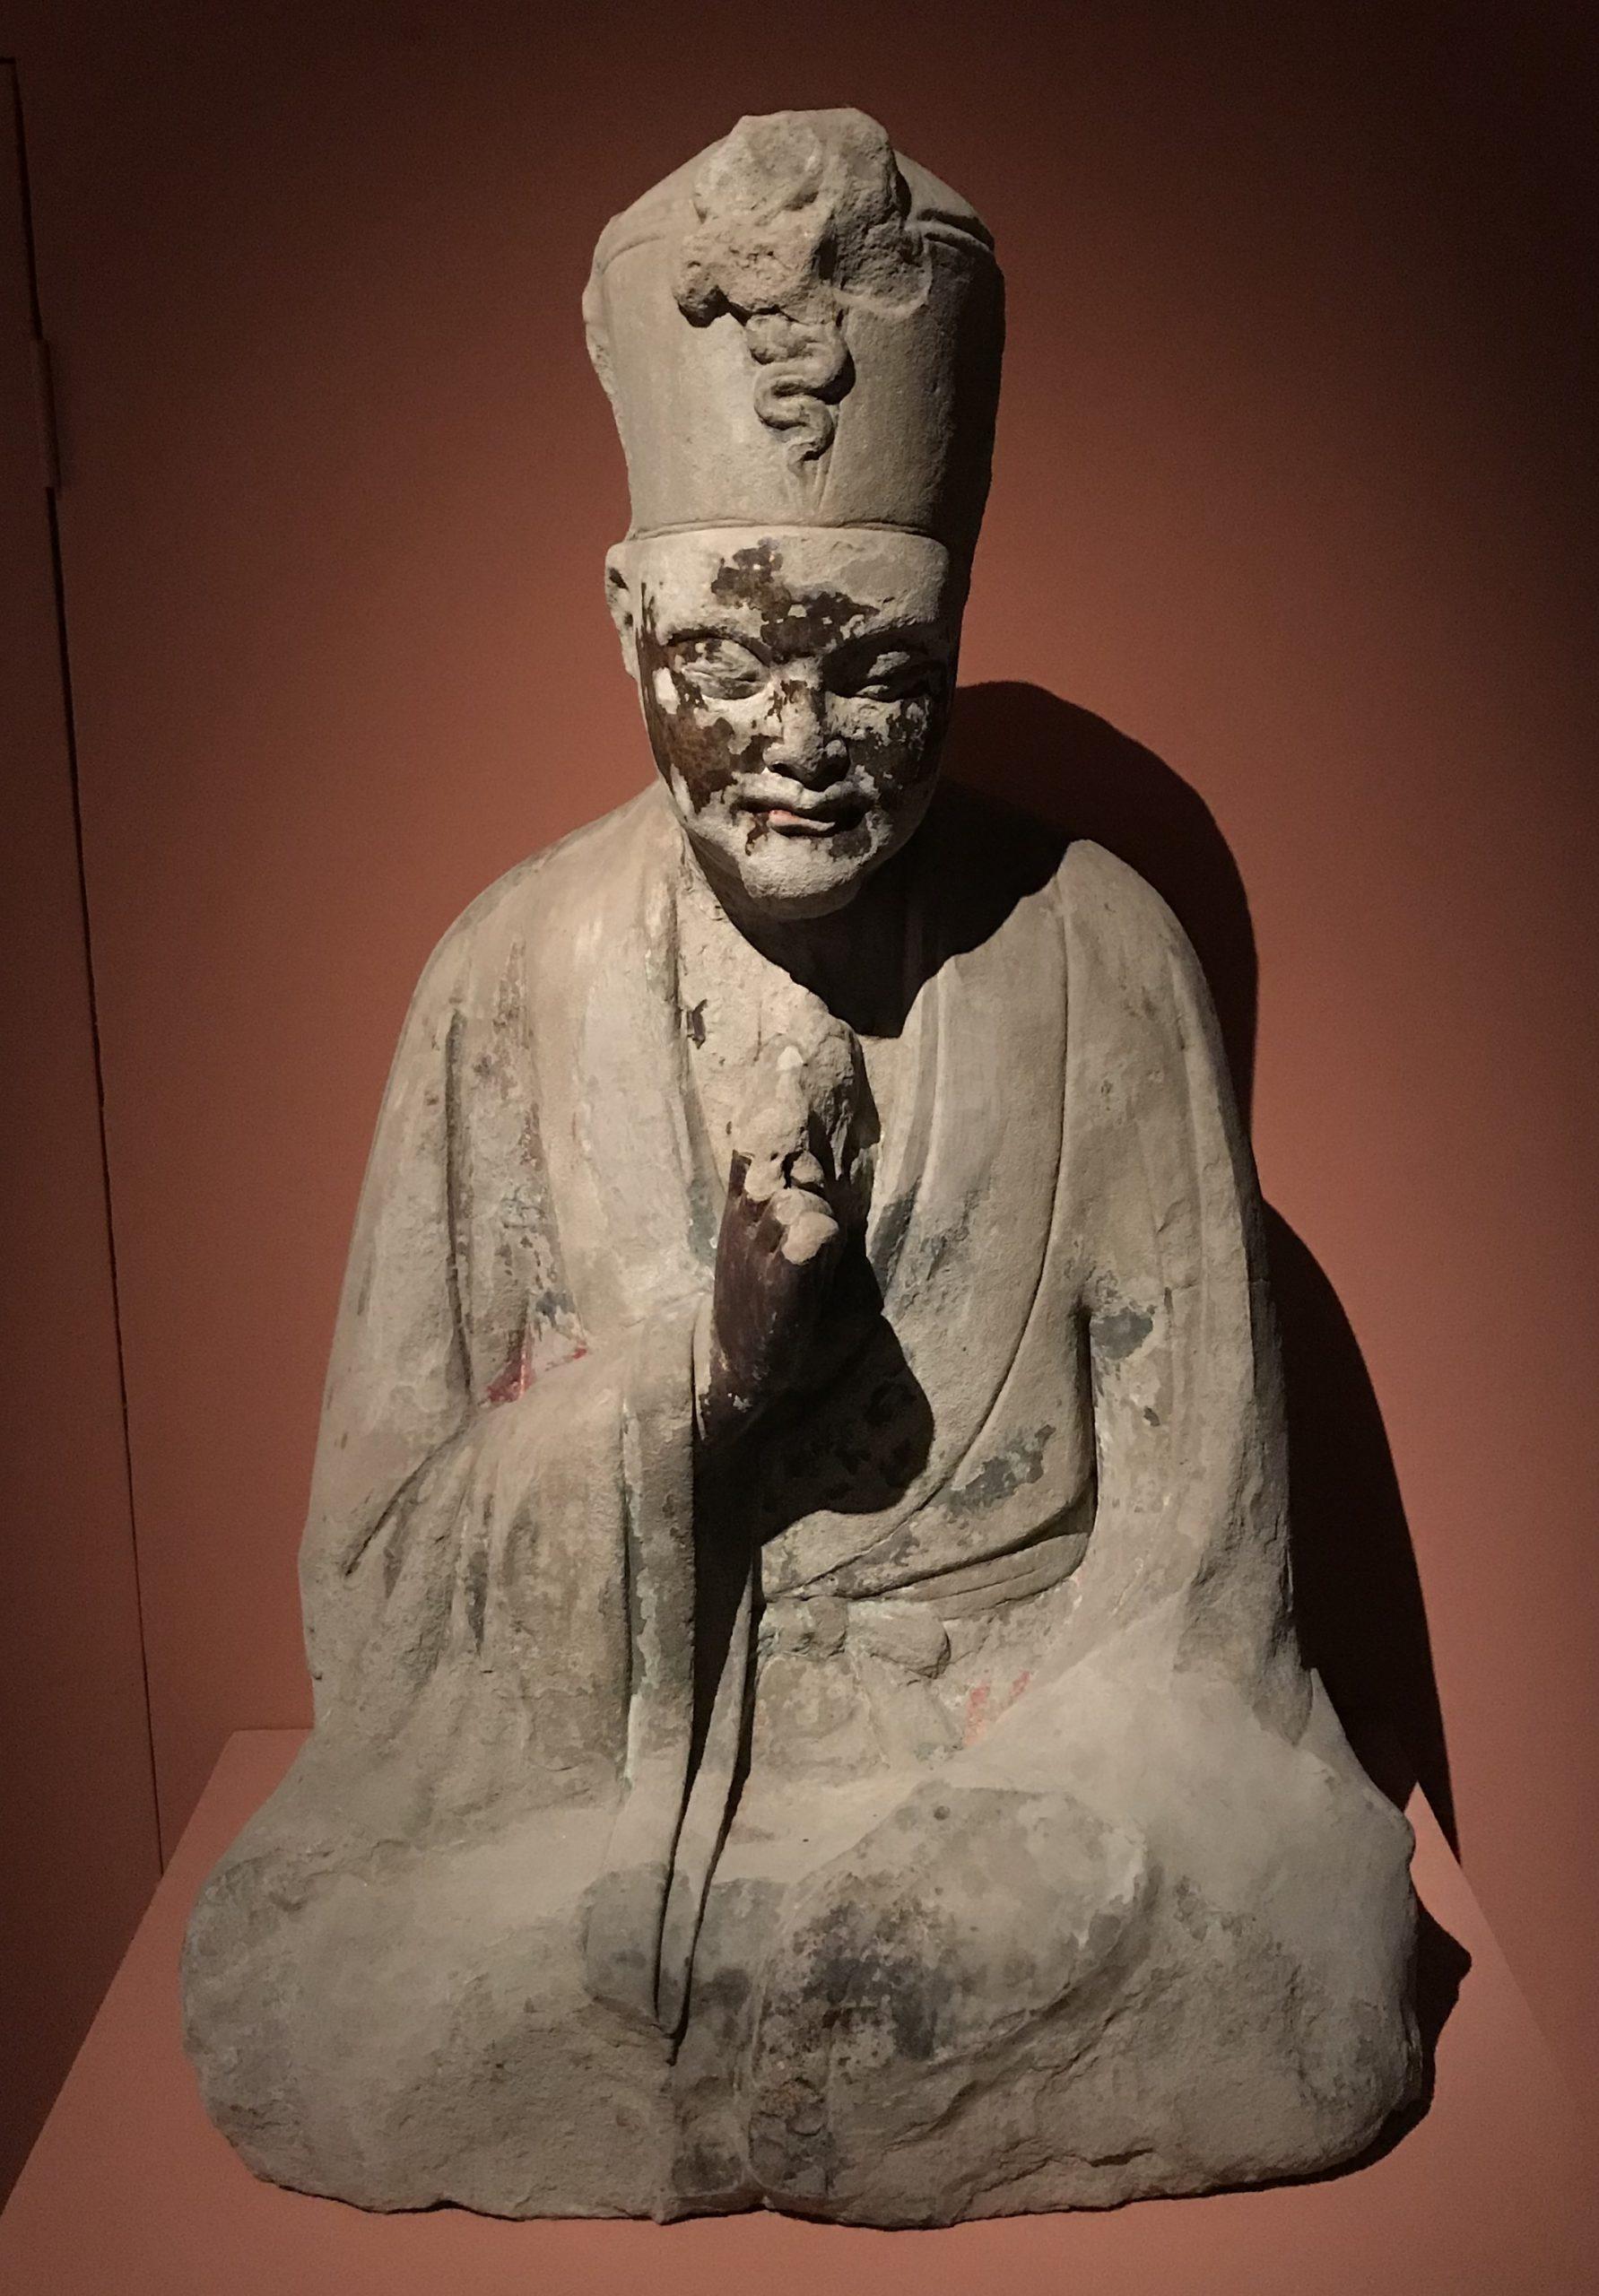 柳本尊像-南宋-天下の大足-大足石刻の発見と継承-金沙遺跡博物館-成都